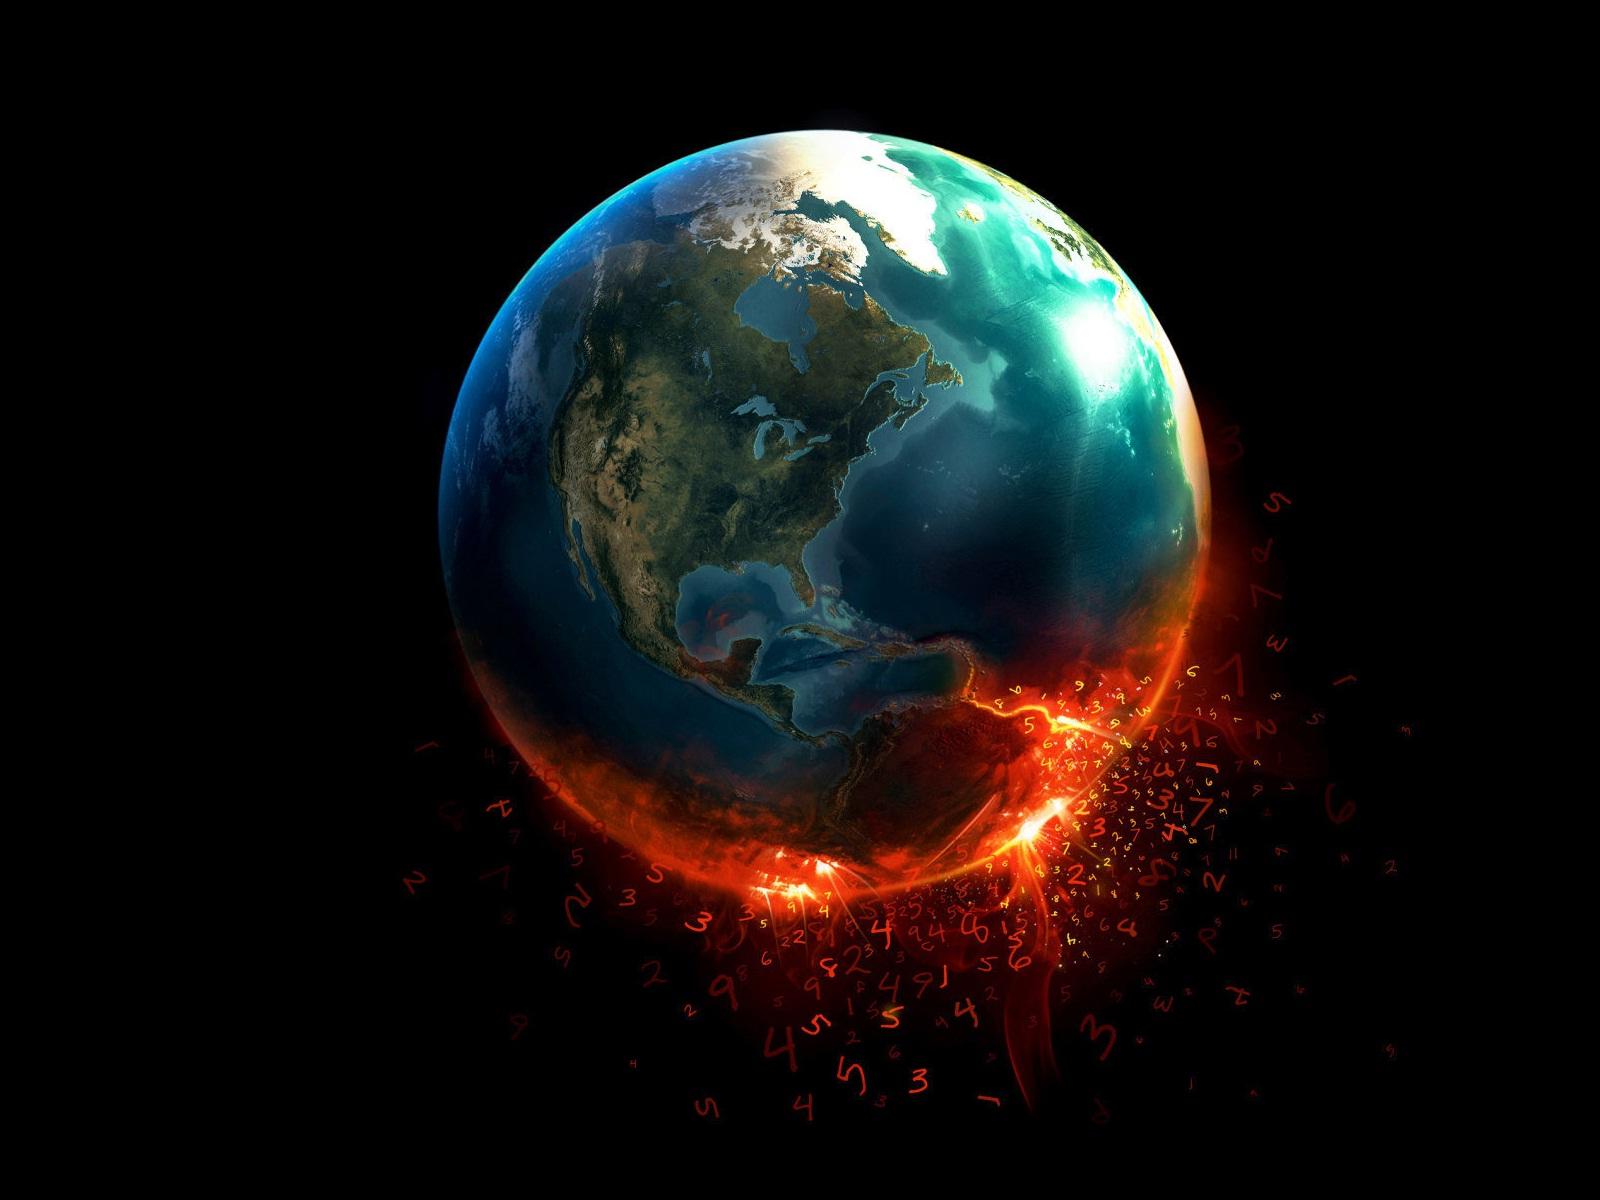 [46+] Cool Wallpapers of Earth on WallpaperSafari